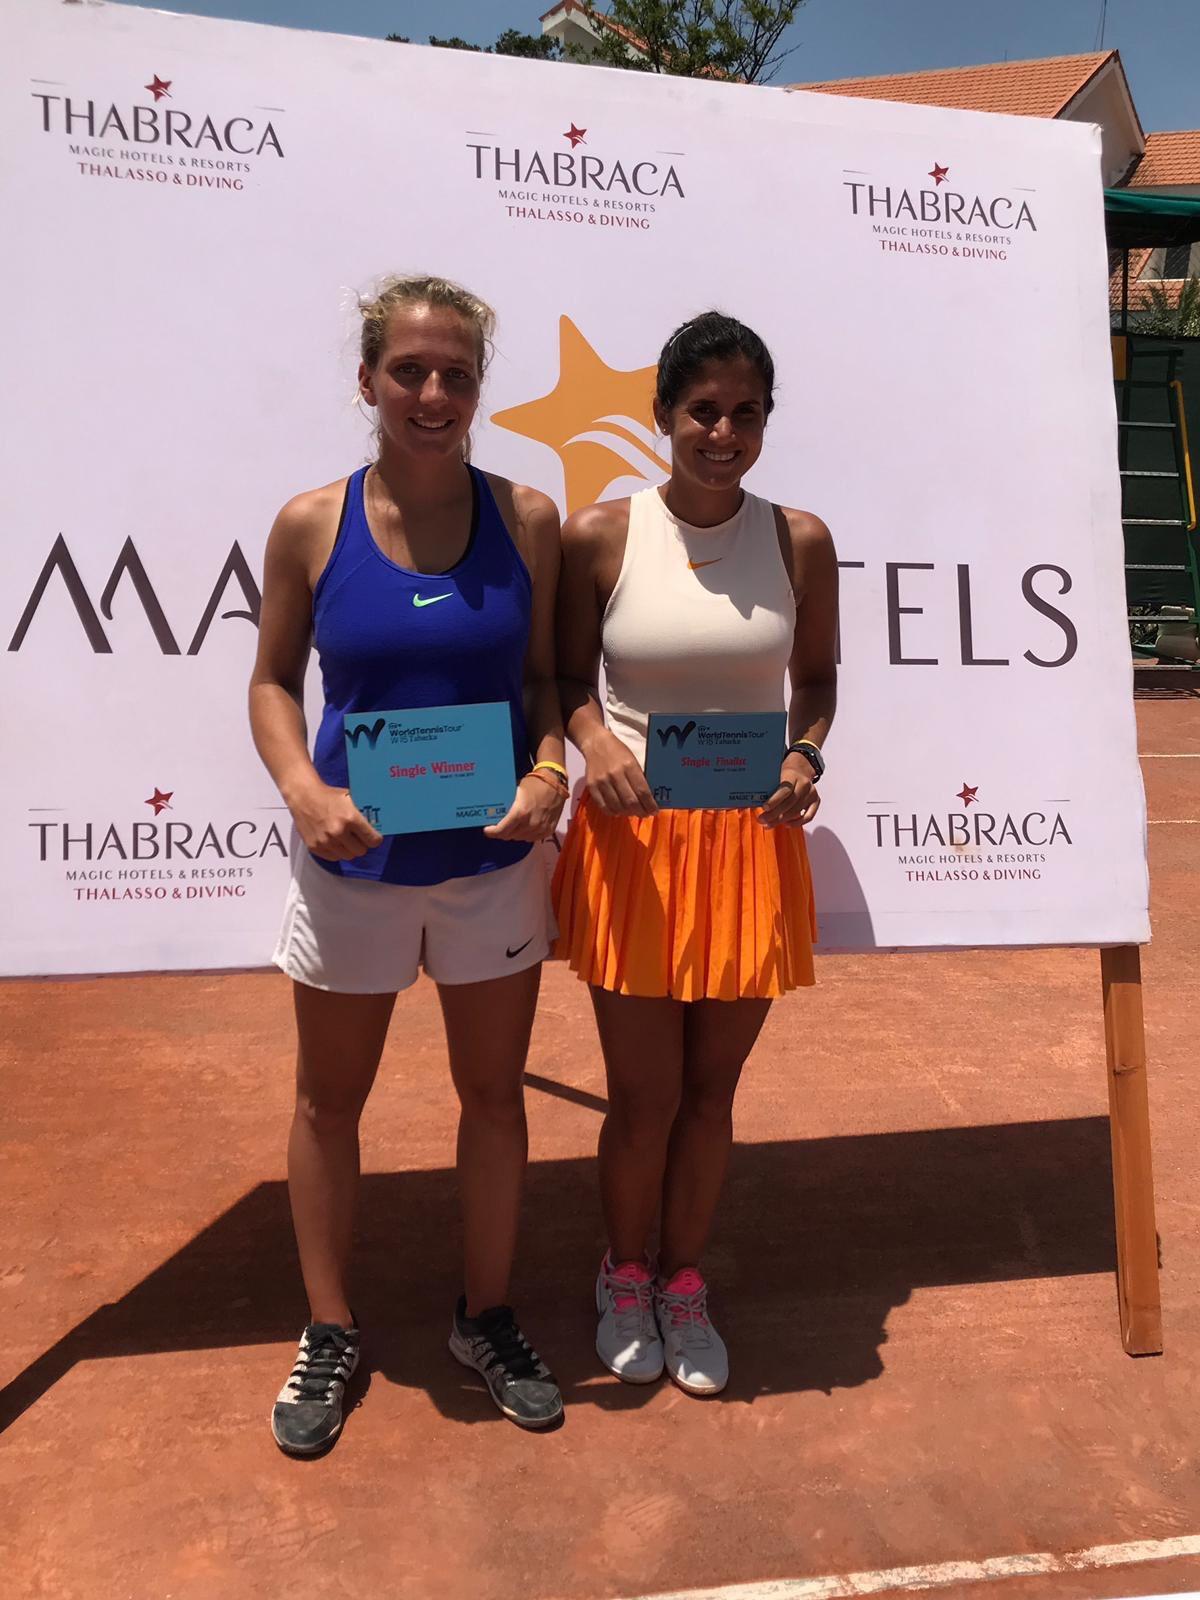 Victoire de Margaux Rouvroy au tournoi 15.000$ de Tabarka (Tunisie)